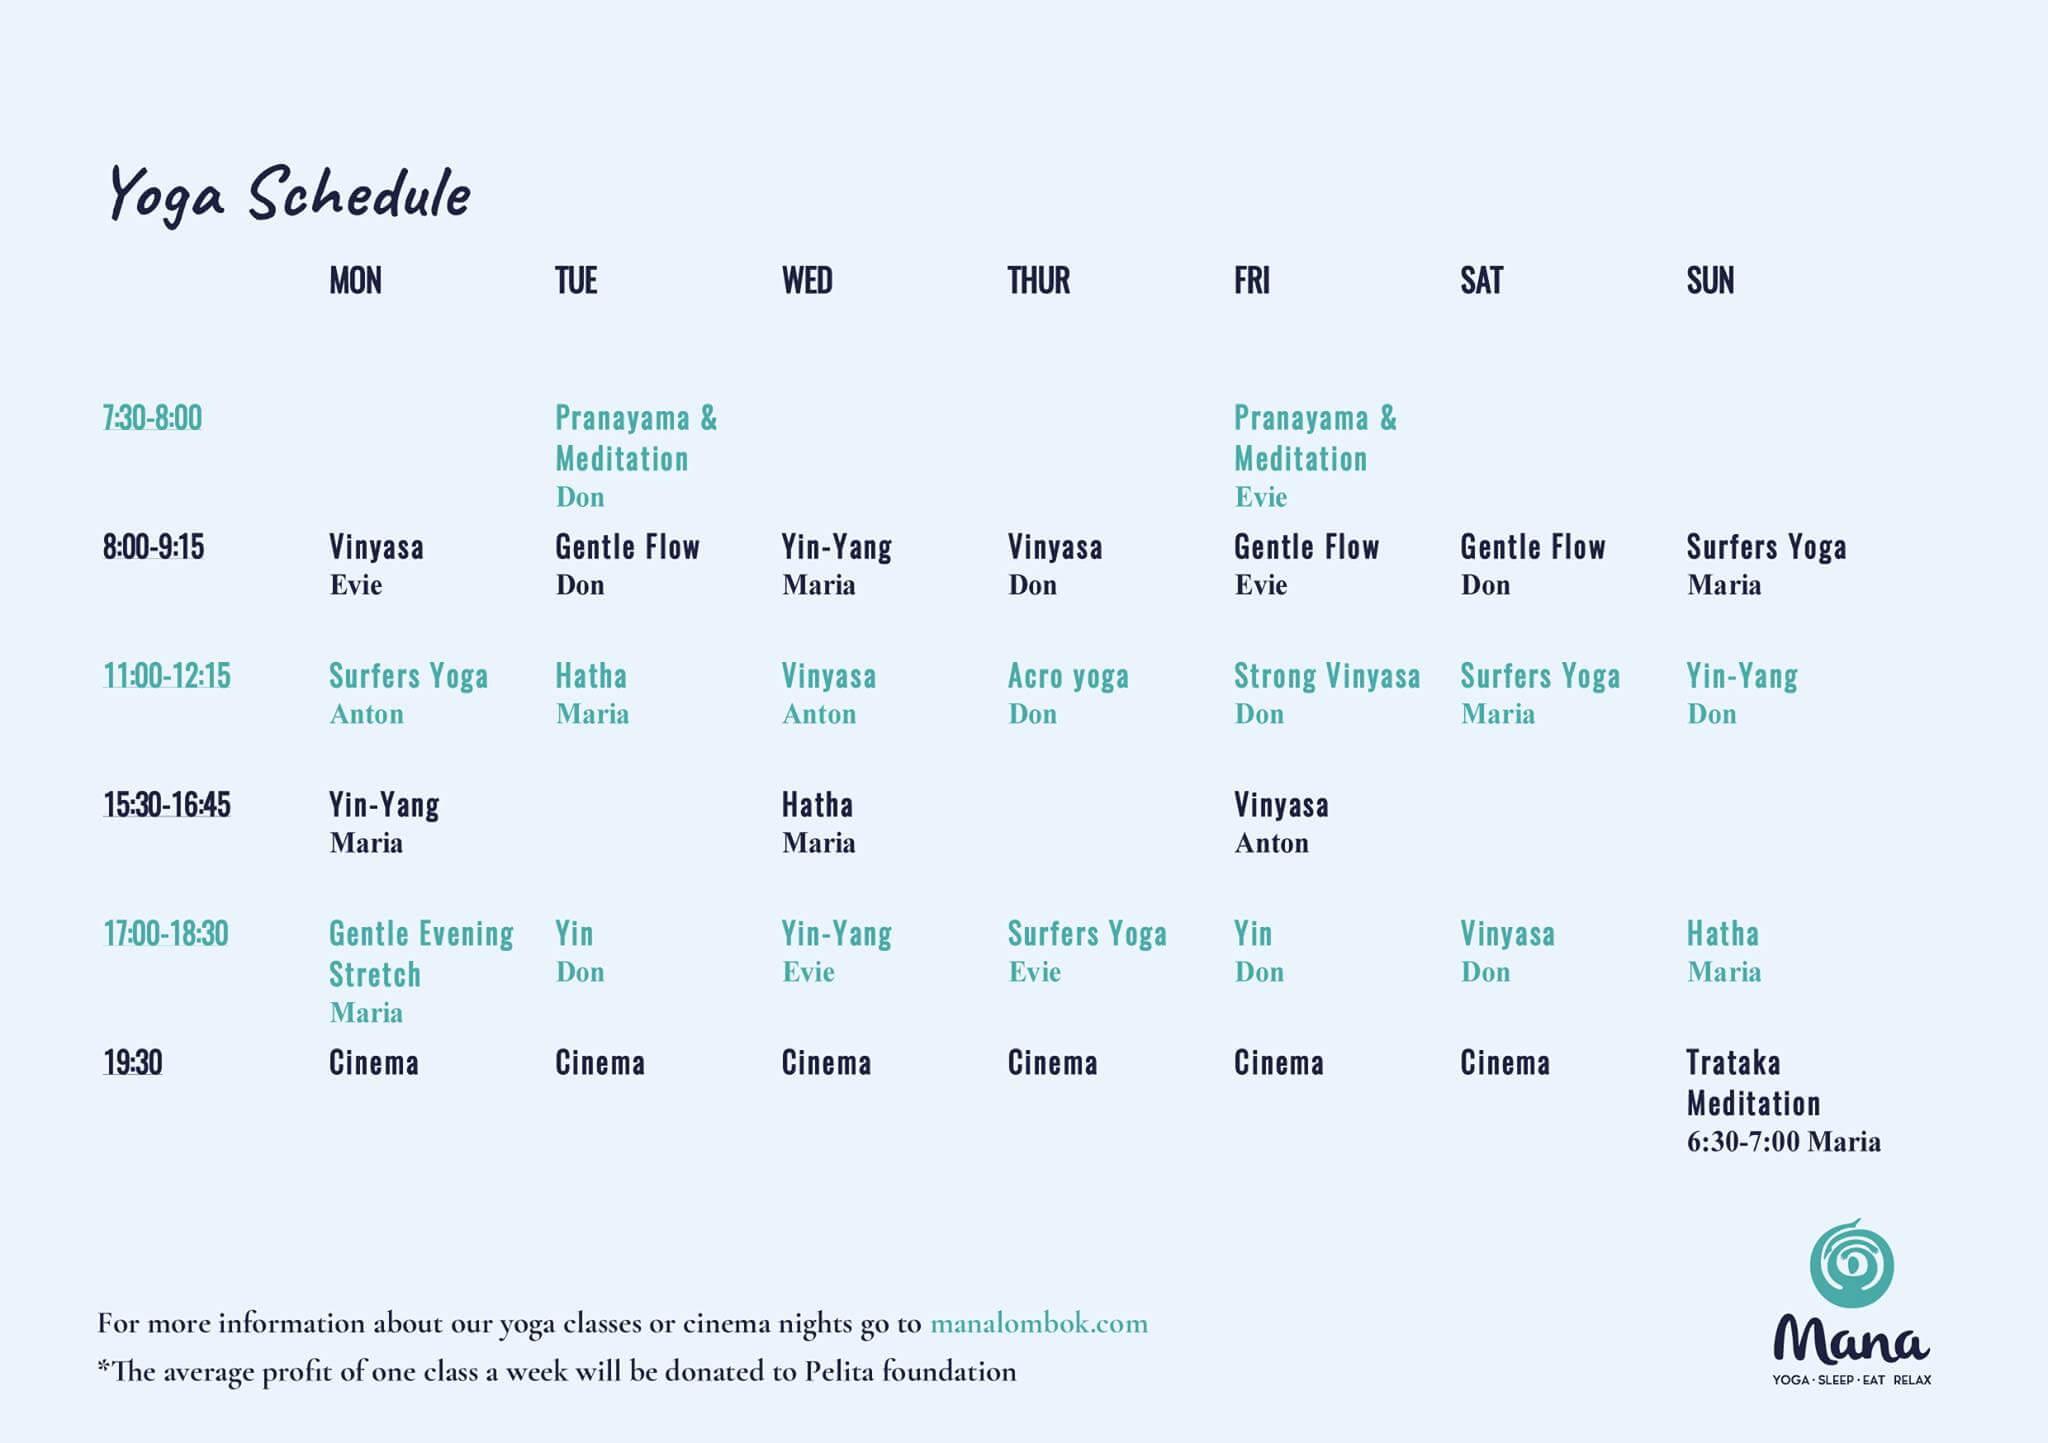 baliSpirit mana yoga studio Schedule